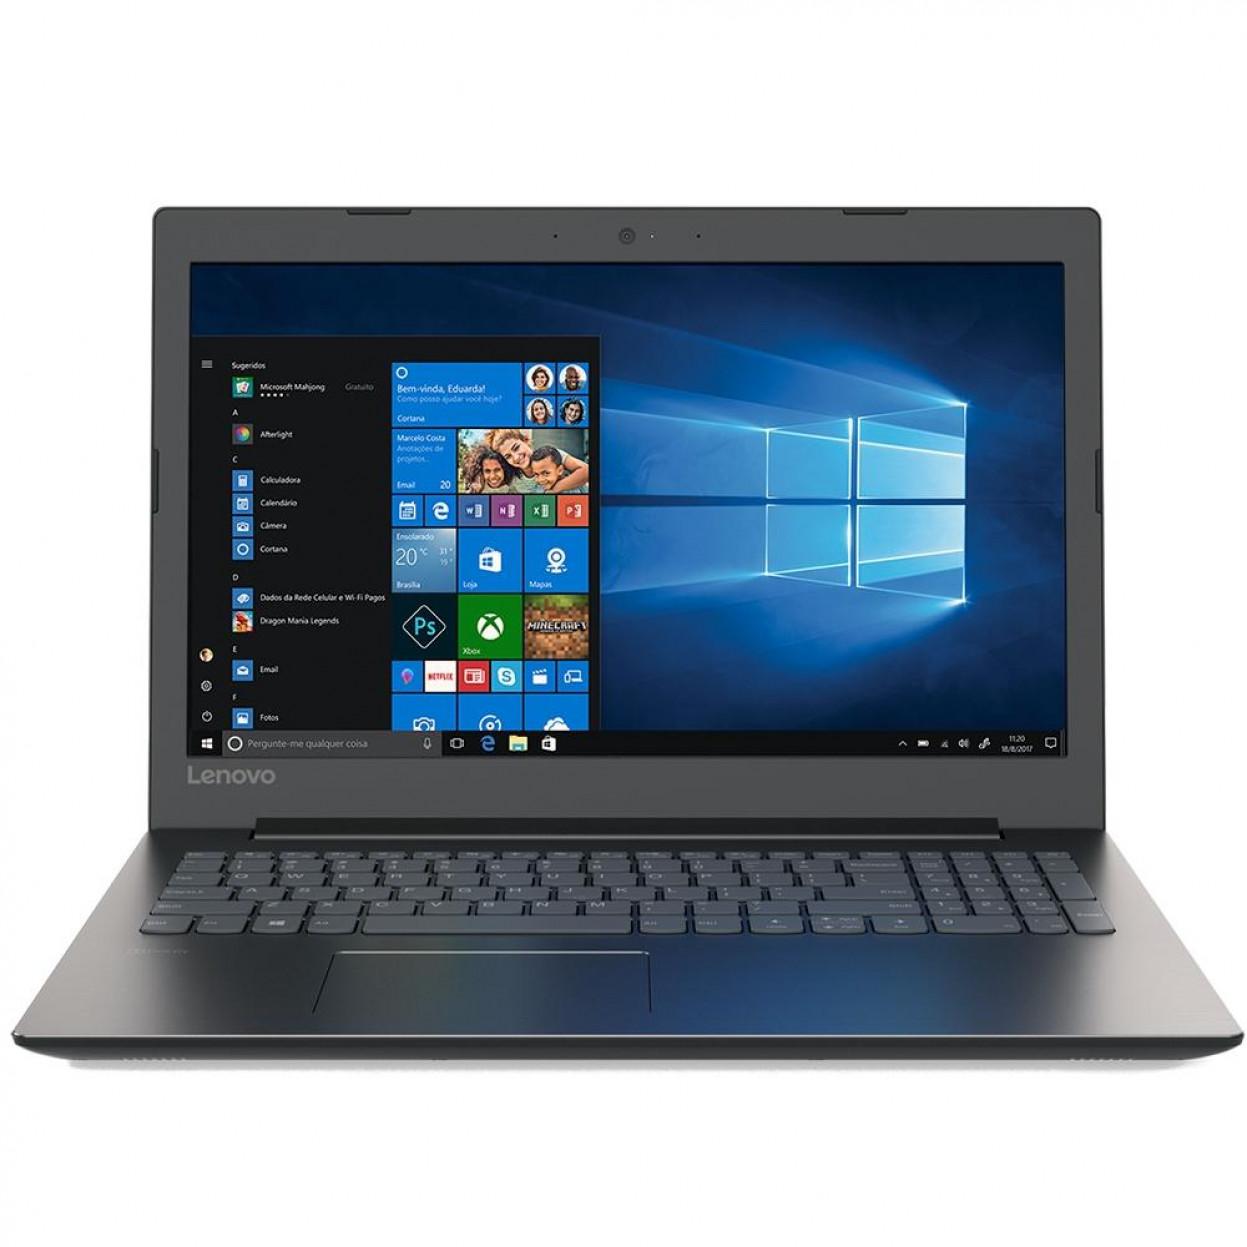 Notebook Lenovo B330 Core I3 7020u Memoria 8gb Ssd 120gb Tela 15.6' Hd Windows 10 Home